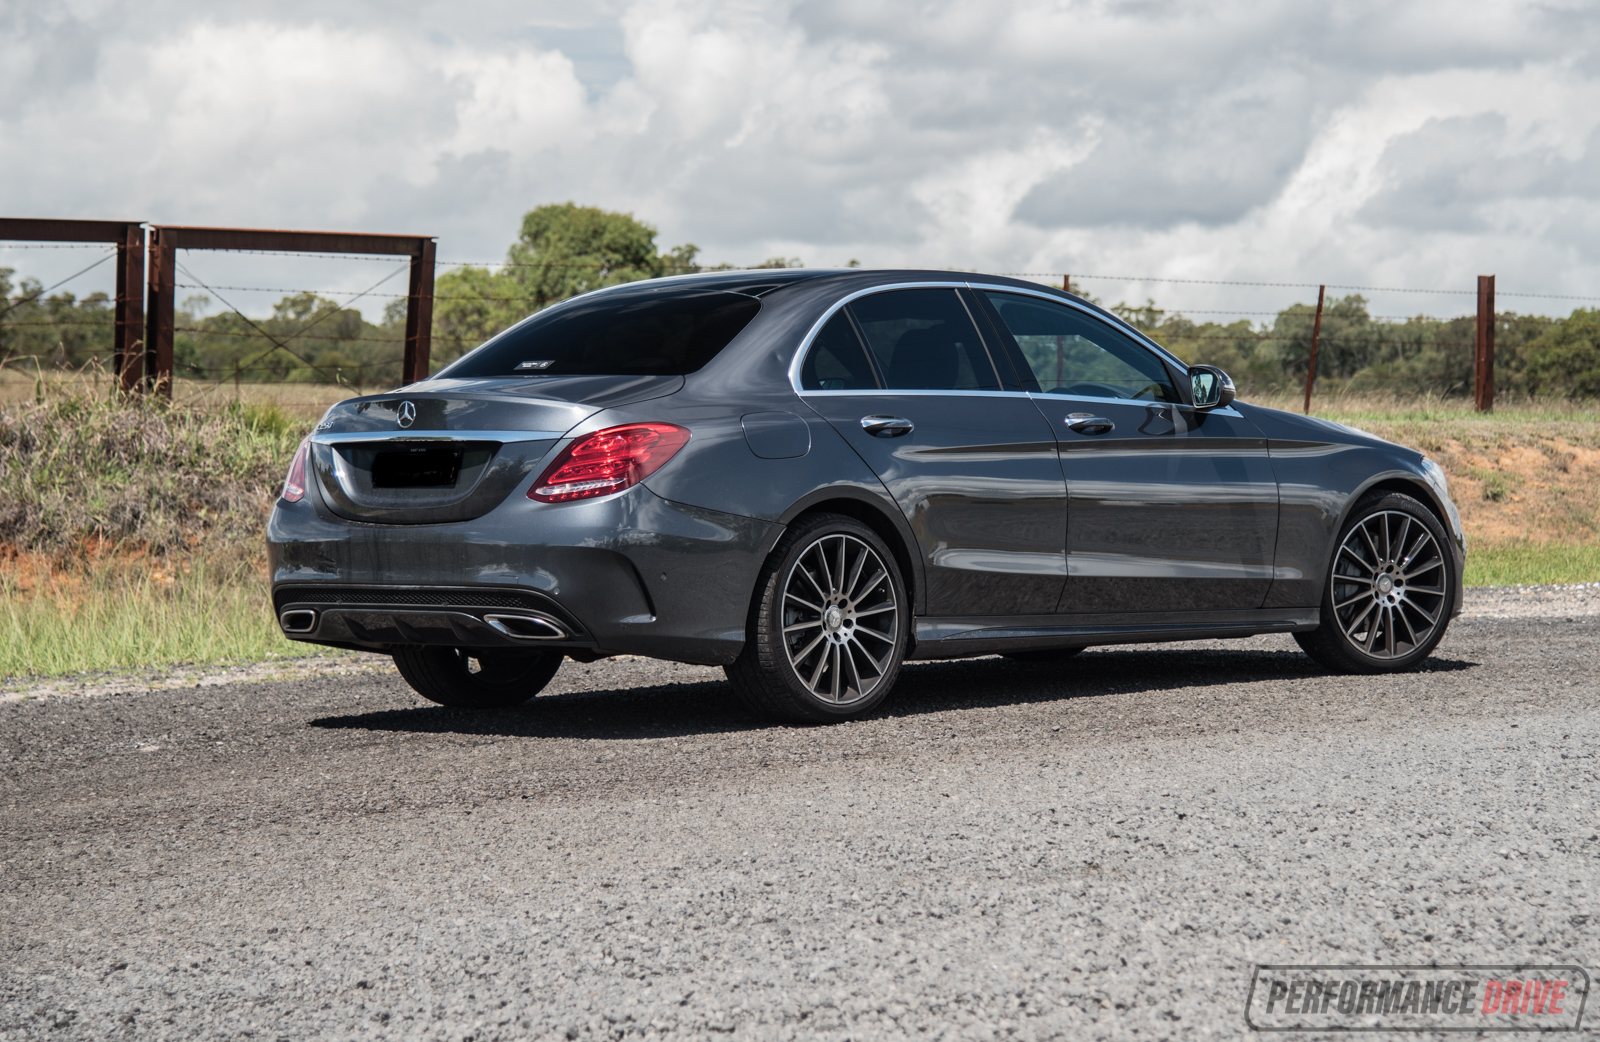 Mercedes benz c 250 amg line review video performancedrive for Video mercedes benz